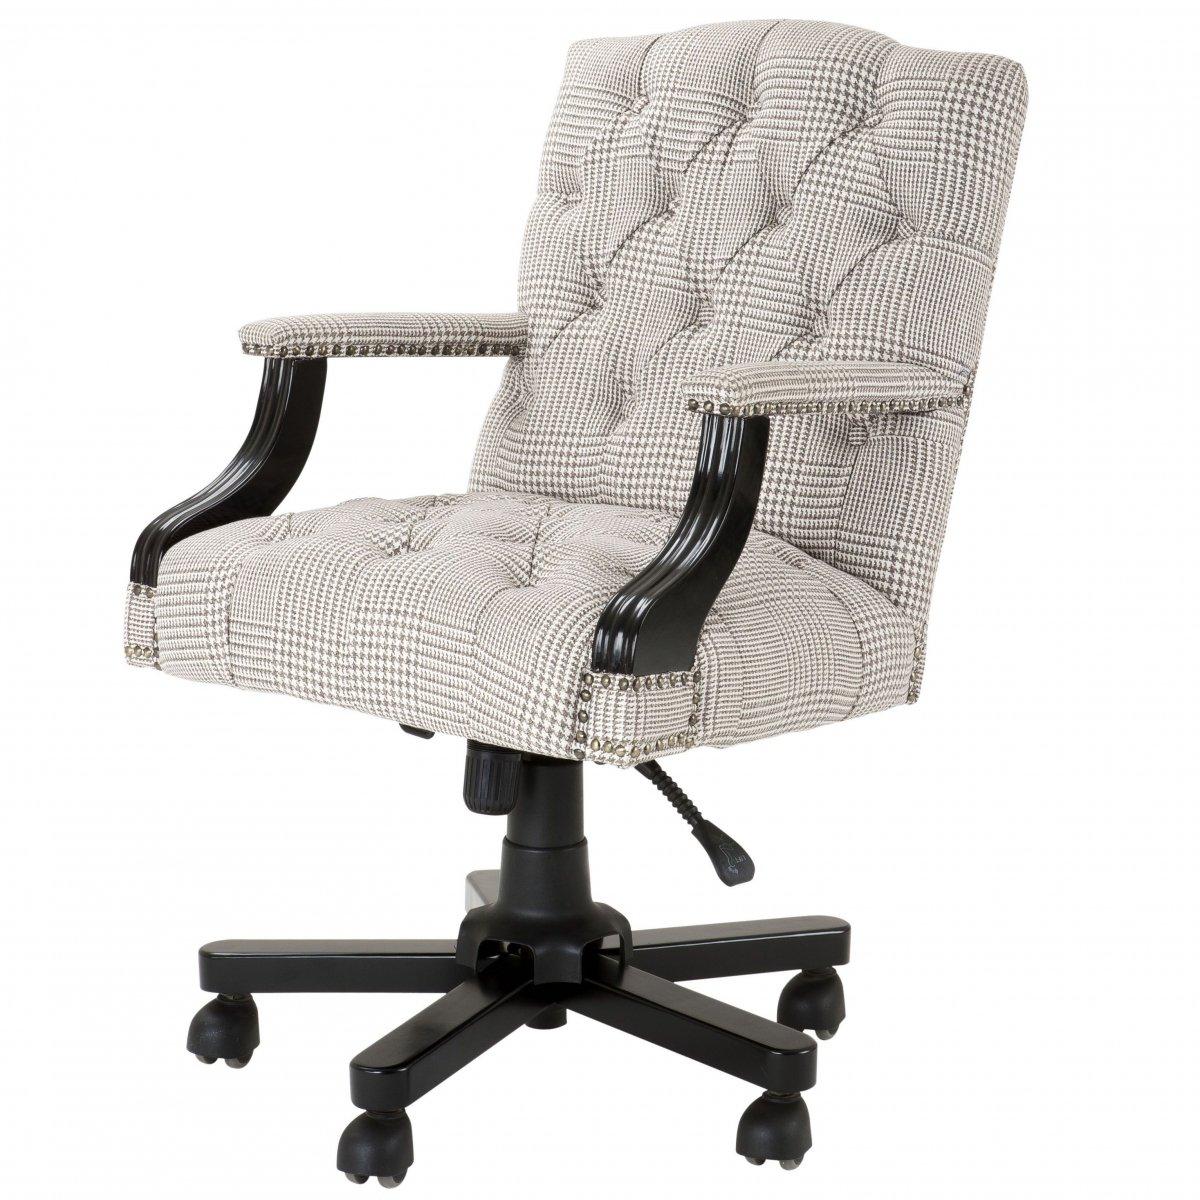 Офисное кресло Eichholtz Desk Chair Burchell brown & white  - фото 1